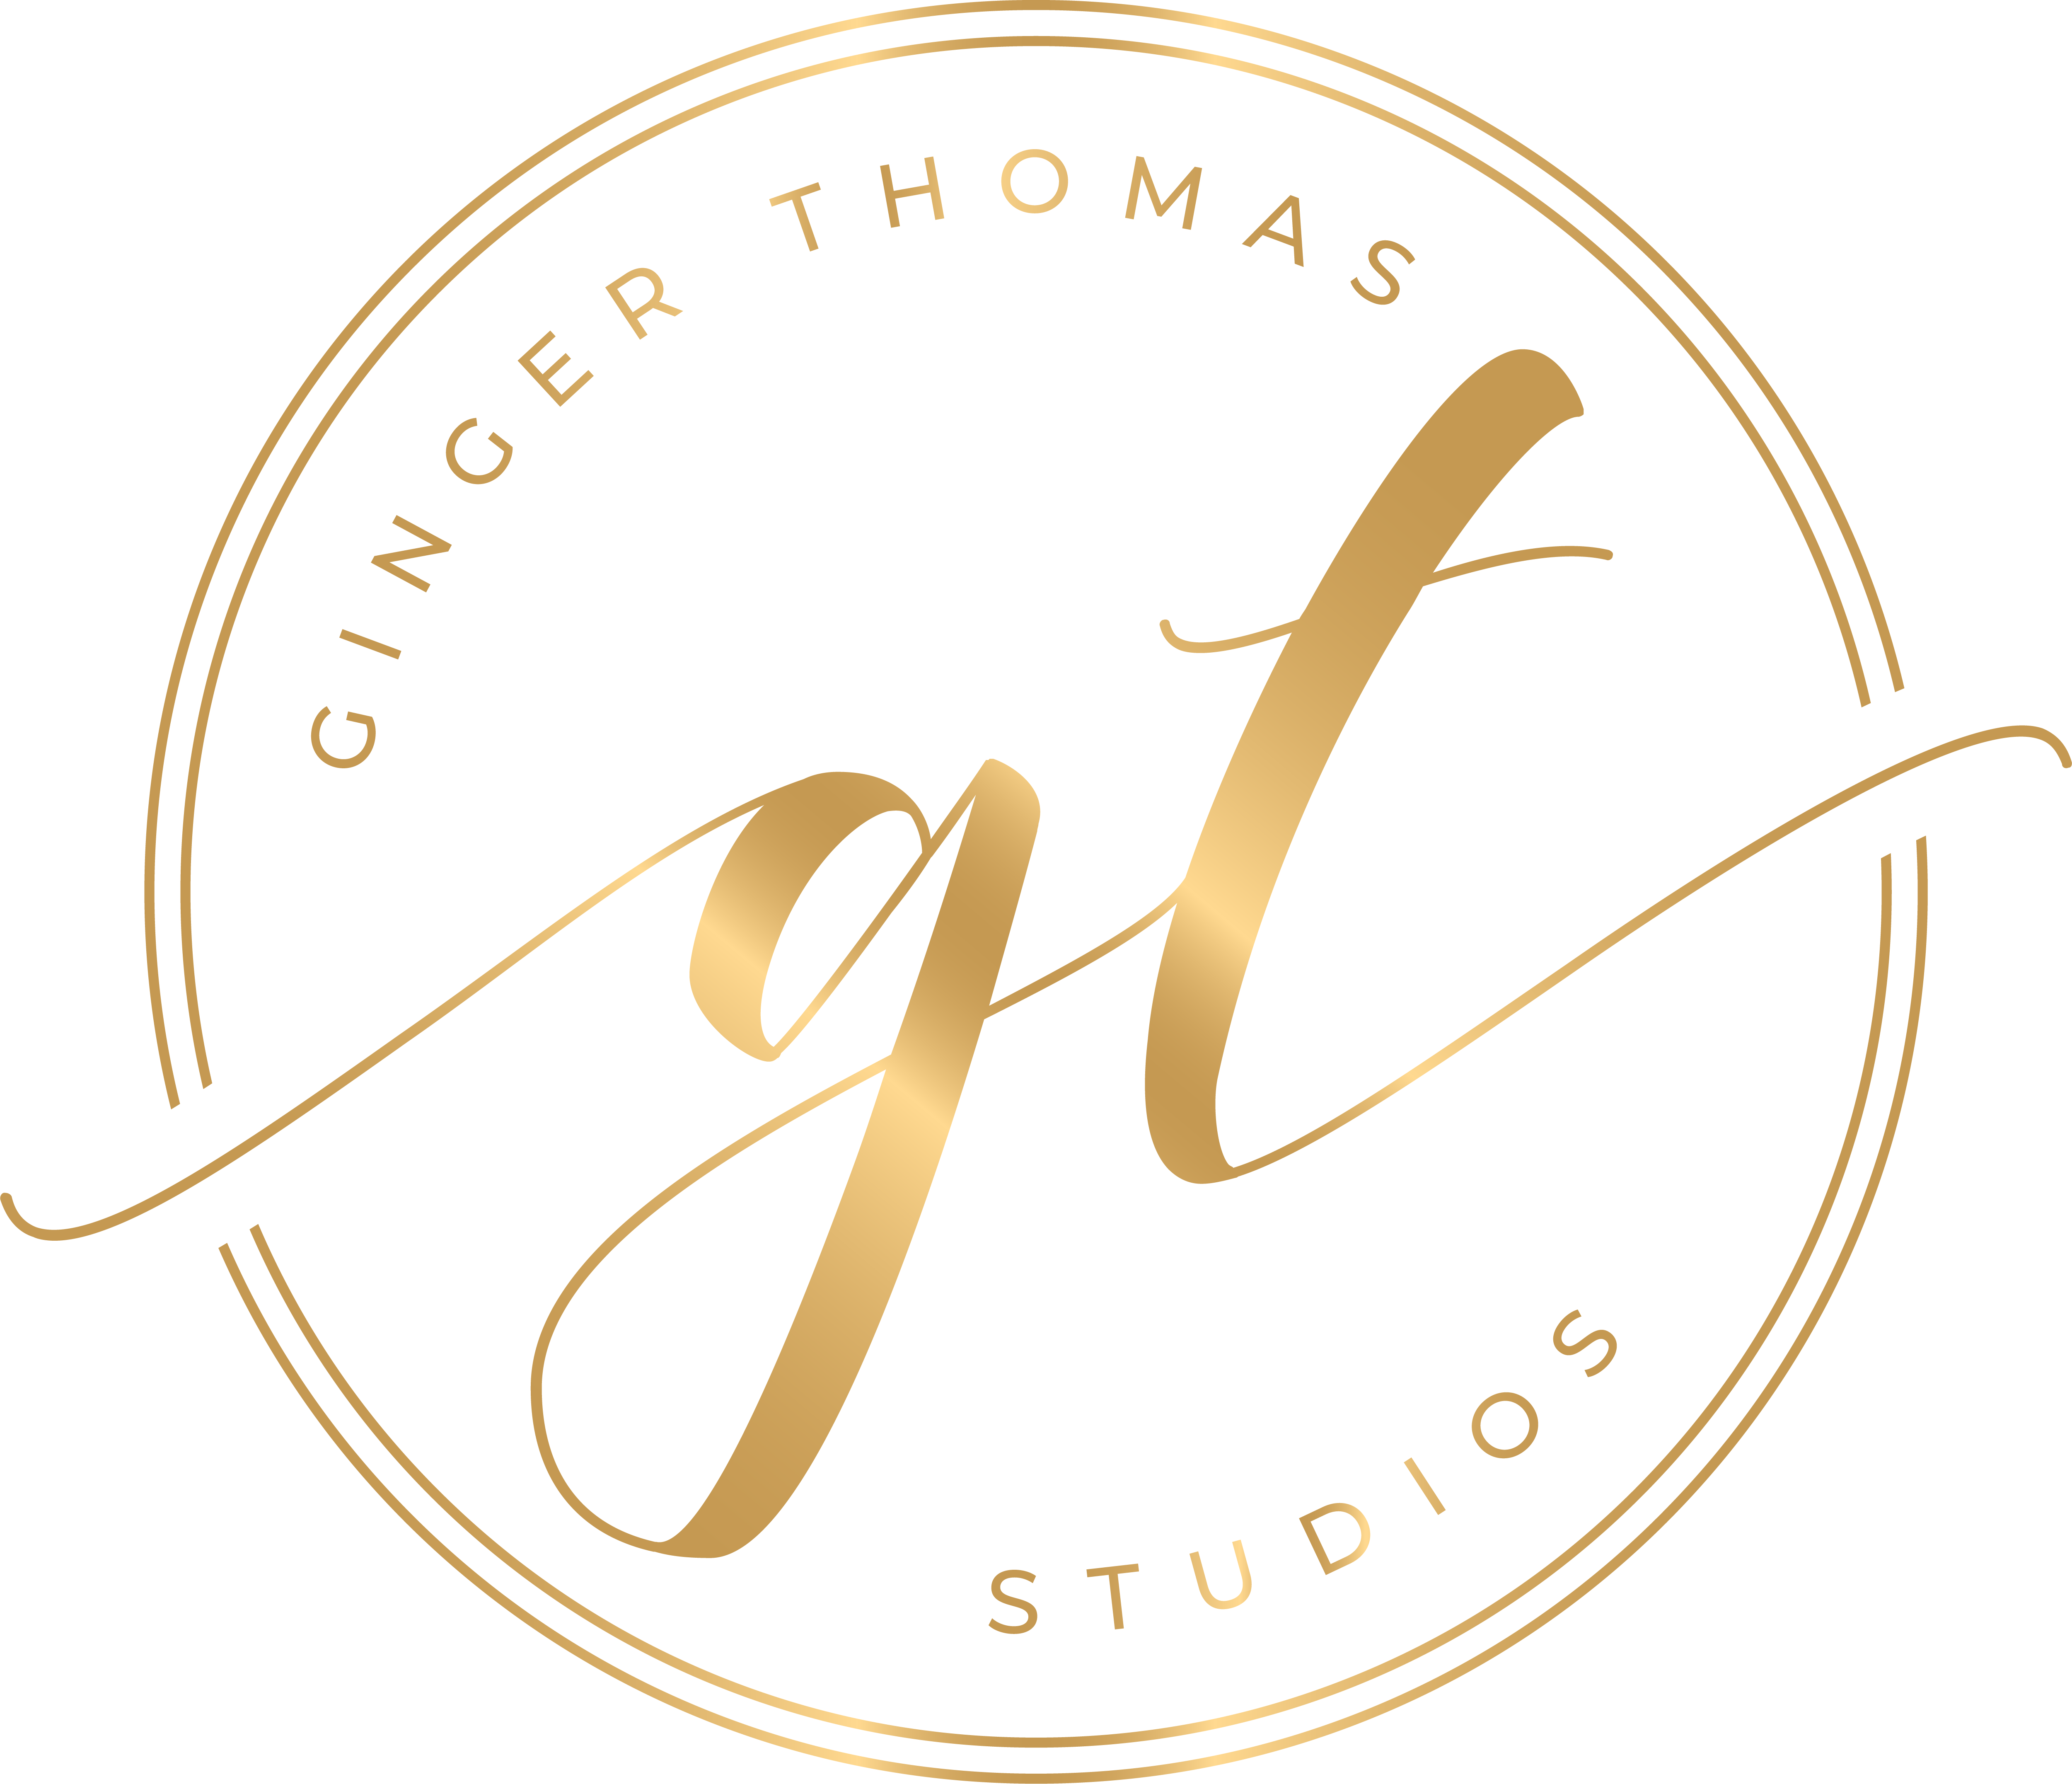 Ginger Thomas Studios